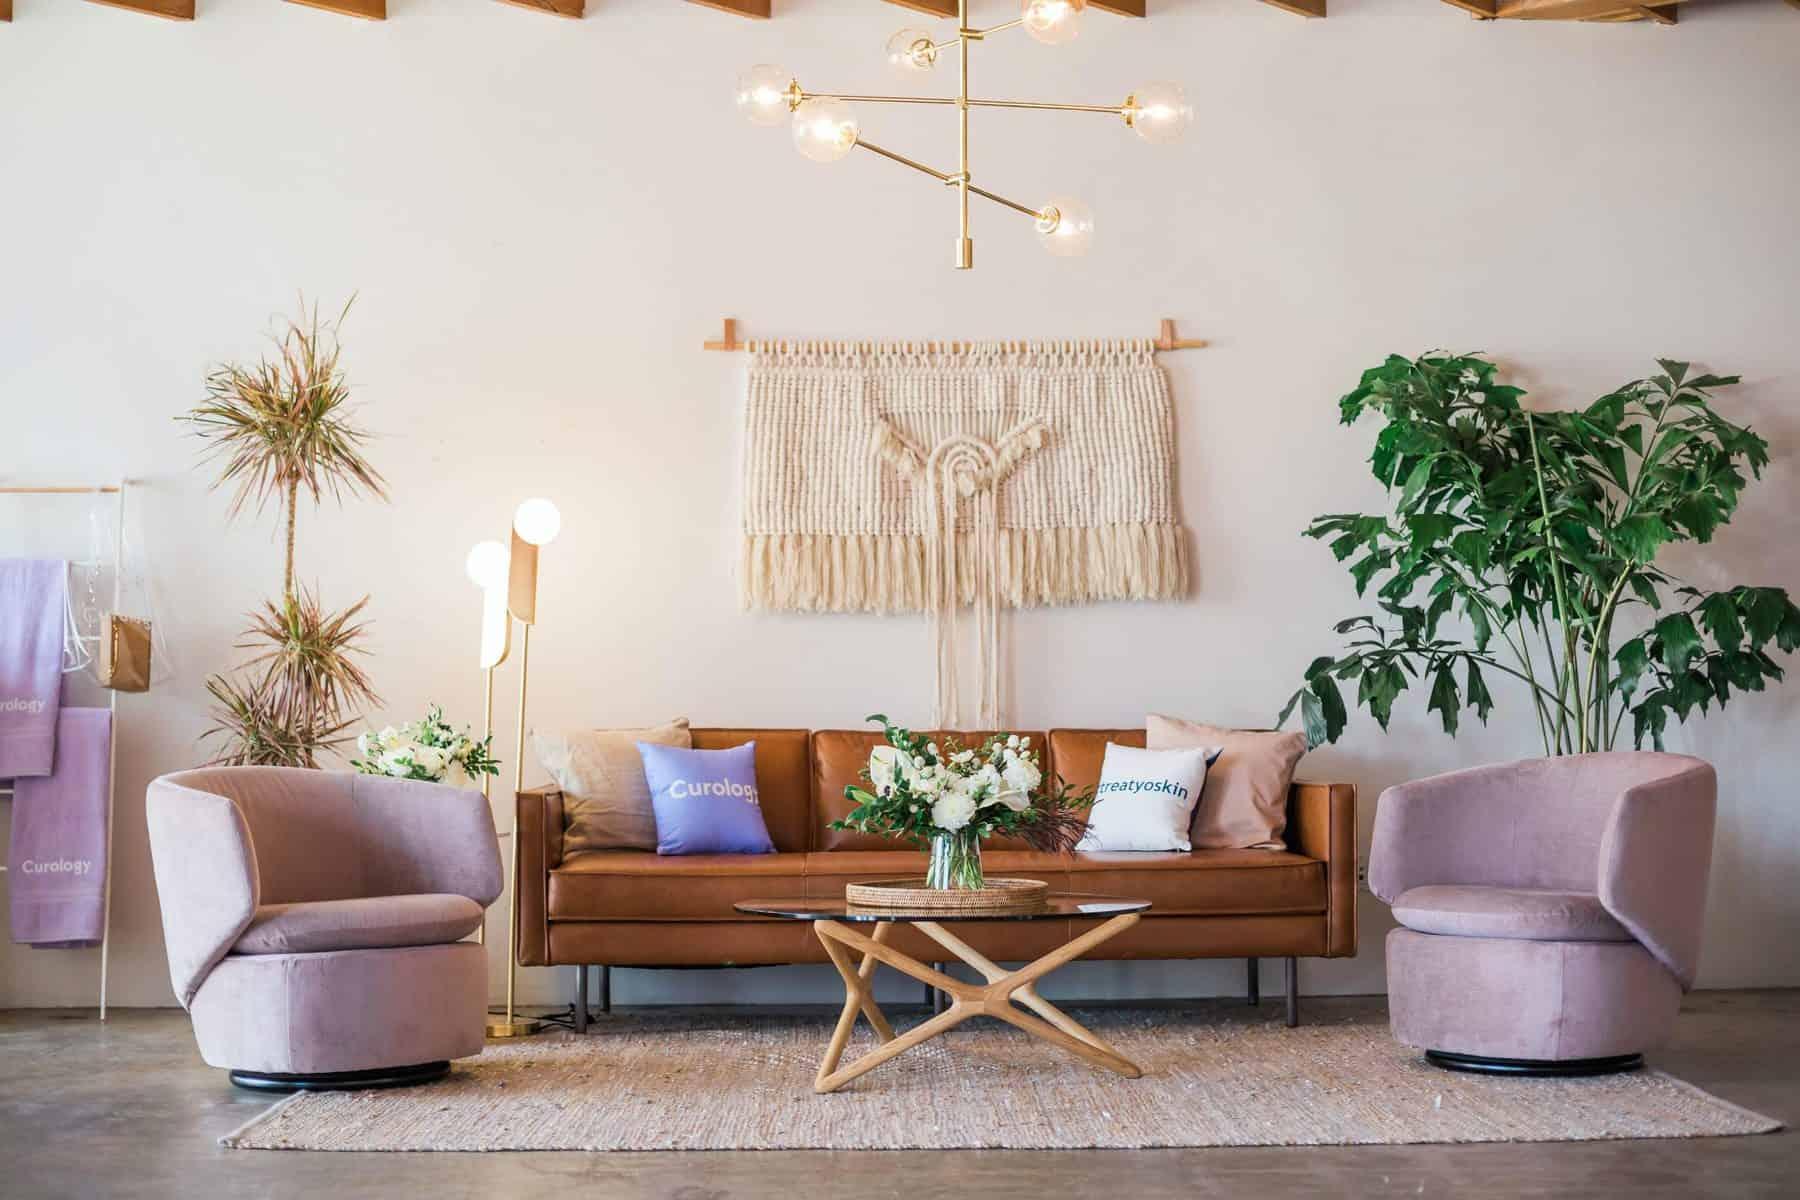 Gorgeous Garden House Design for a Perfect Summer Hideaway